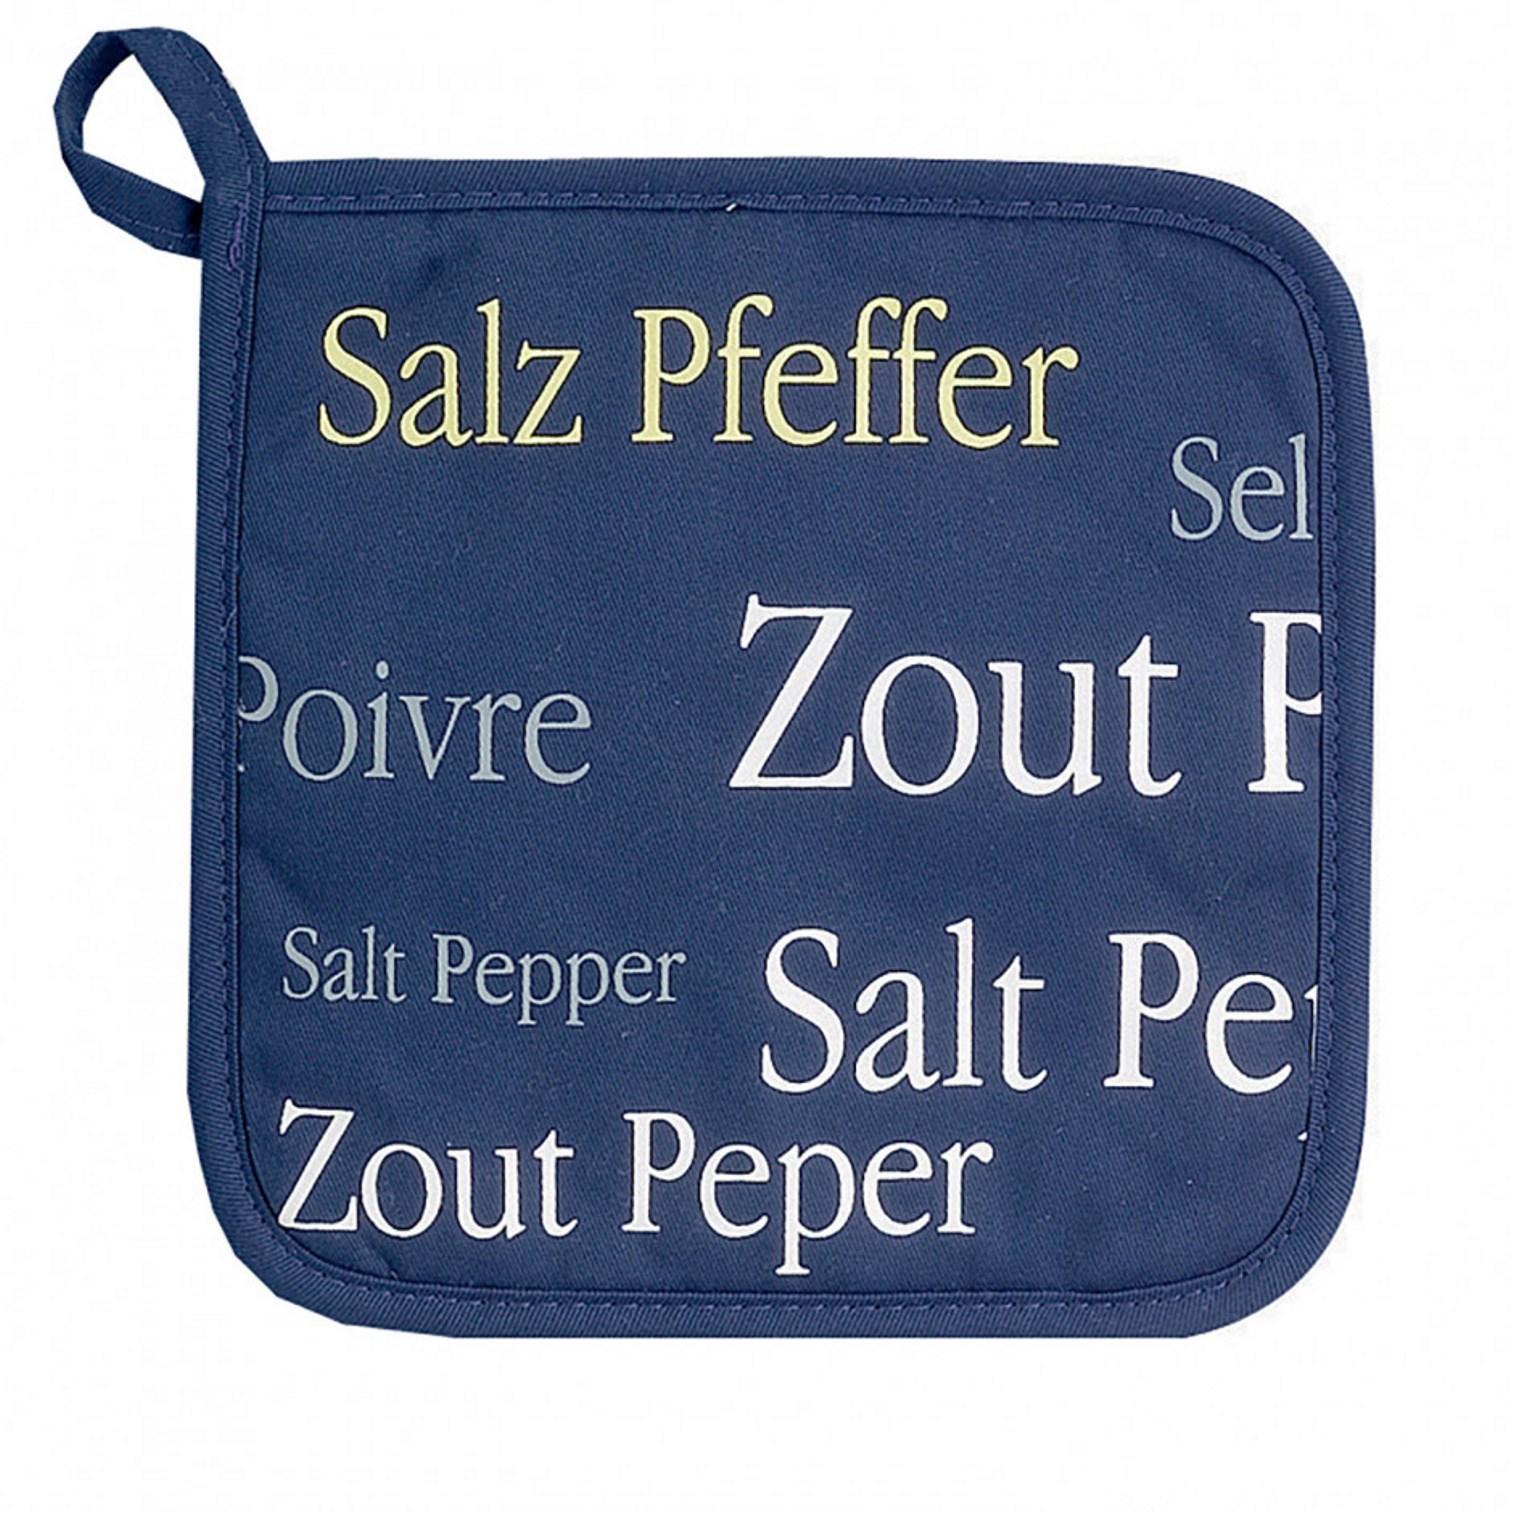 Онлайн каталог PROMENU: Прихватка Winkler SEL & POIVRE, 20х20 см, синий с буквами                               2248 060 000